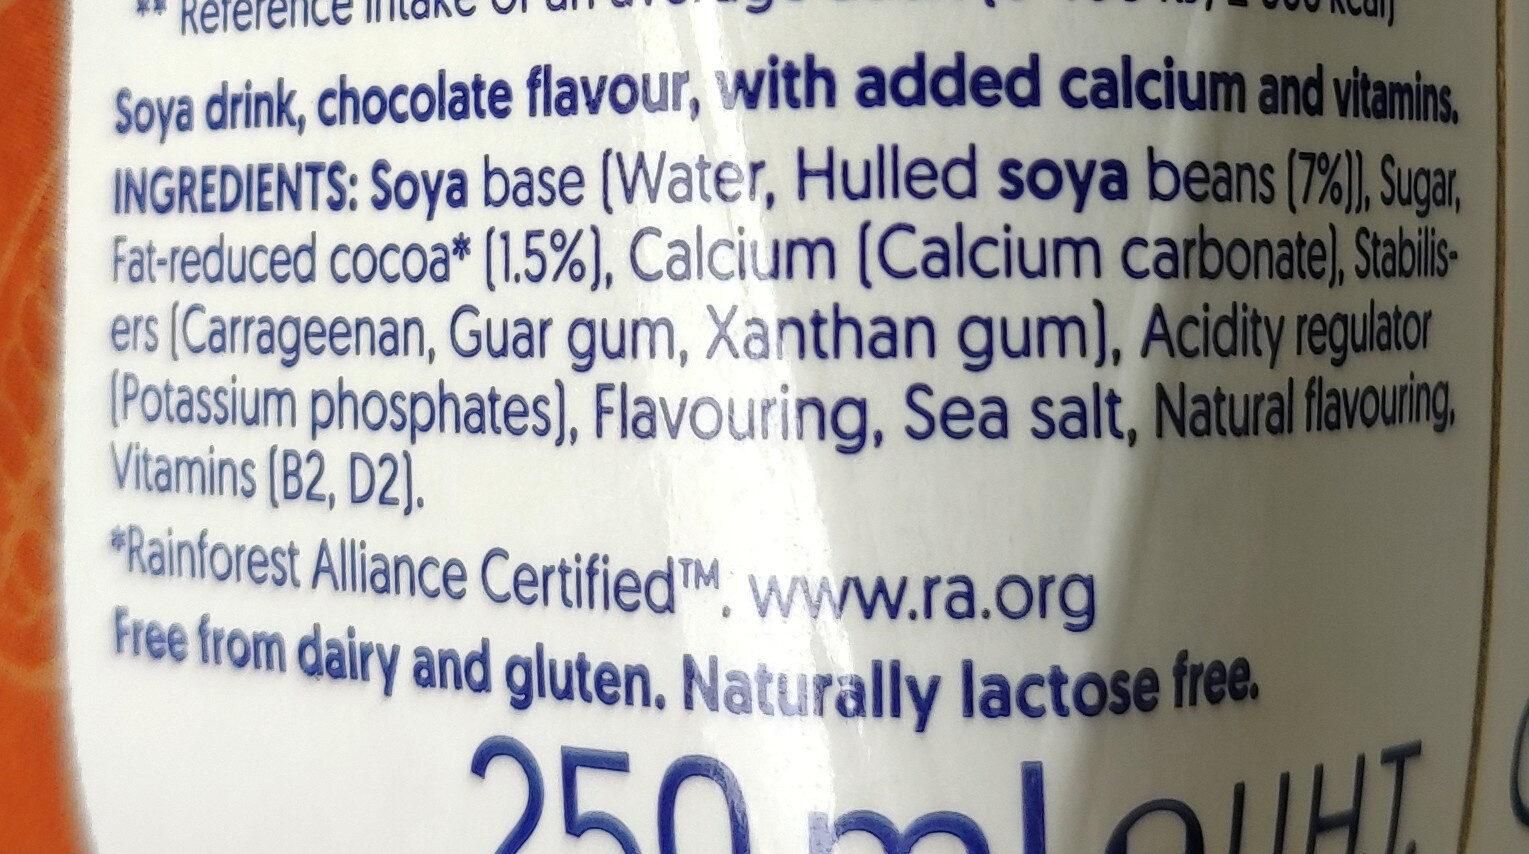 Soya drink chocolate flavour - Ingrediënten - en